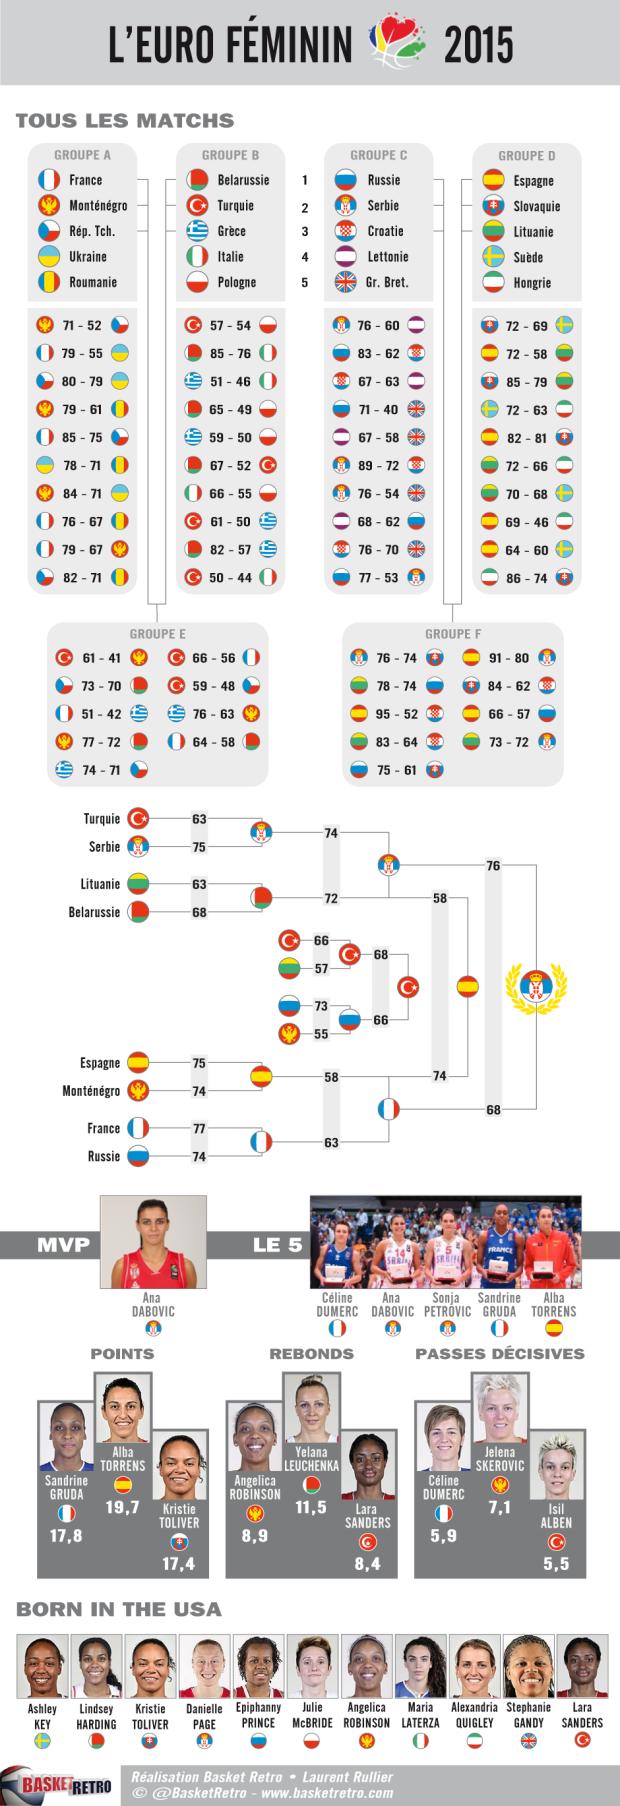 Euro F 2015